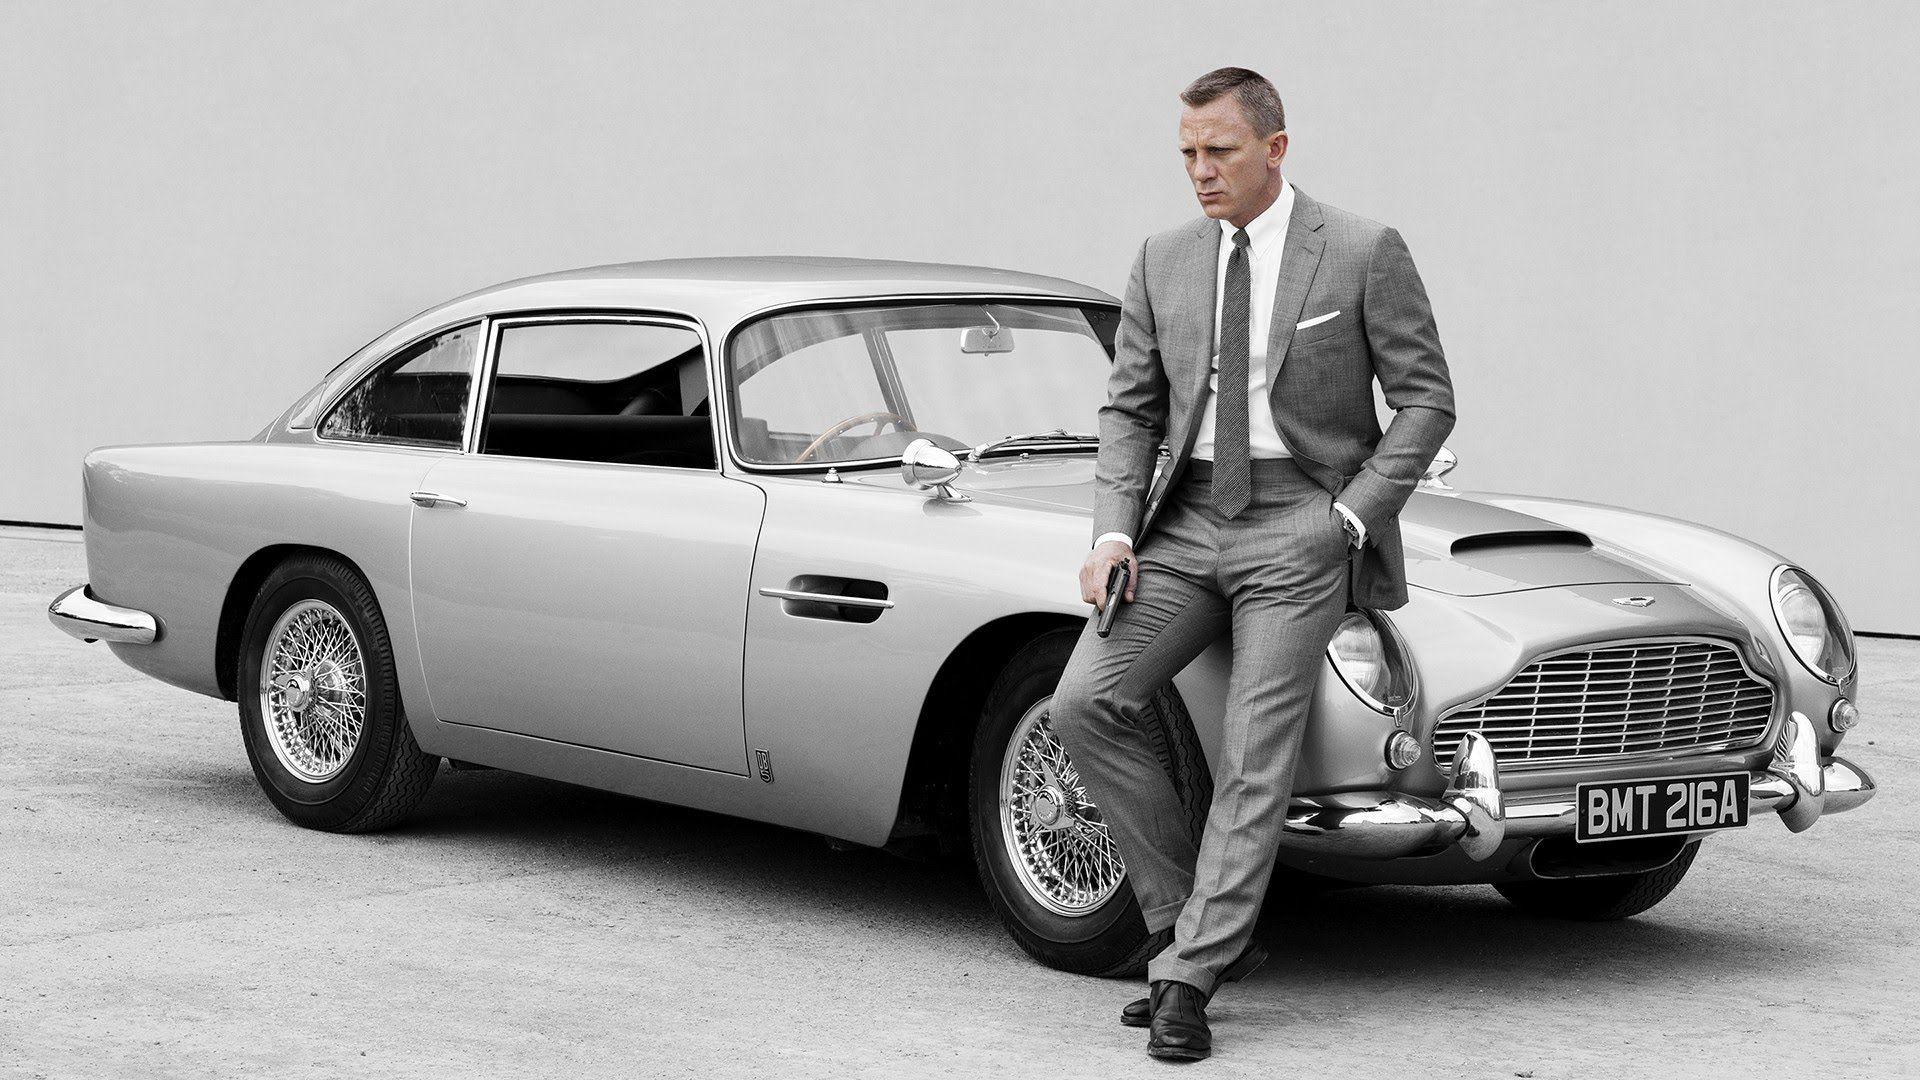 Aston Martin DB5 : 007